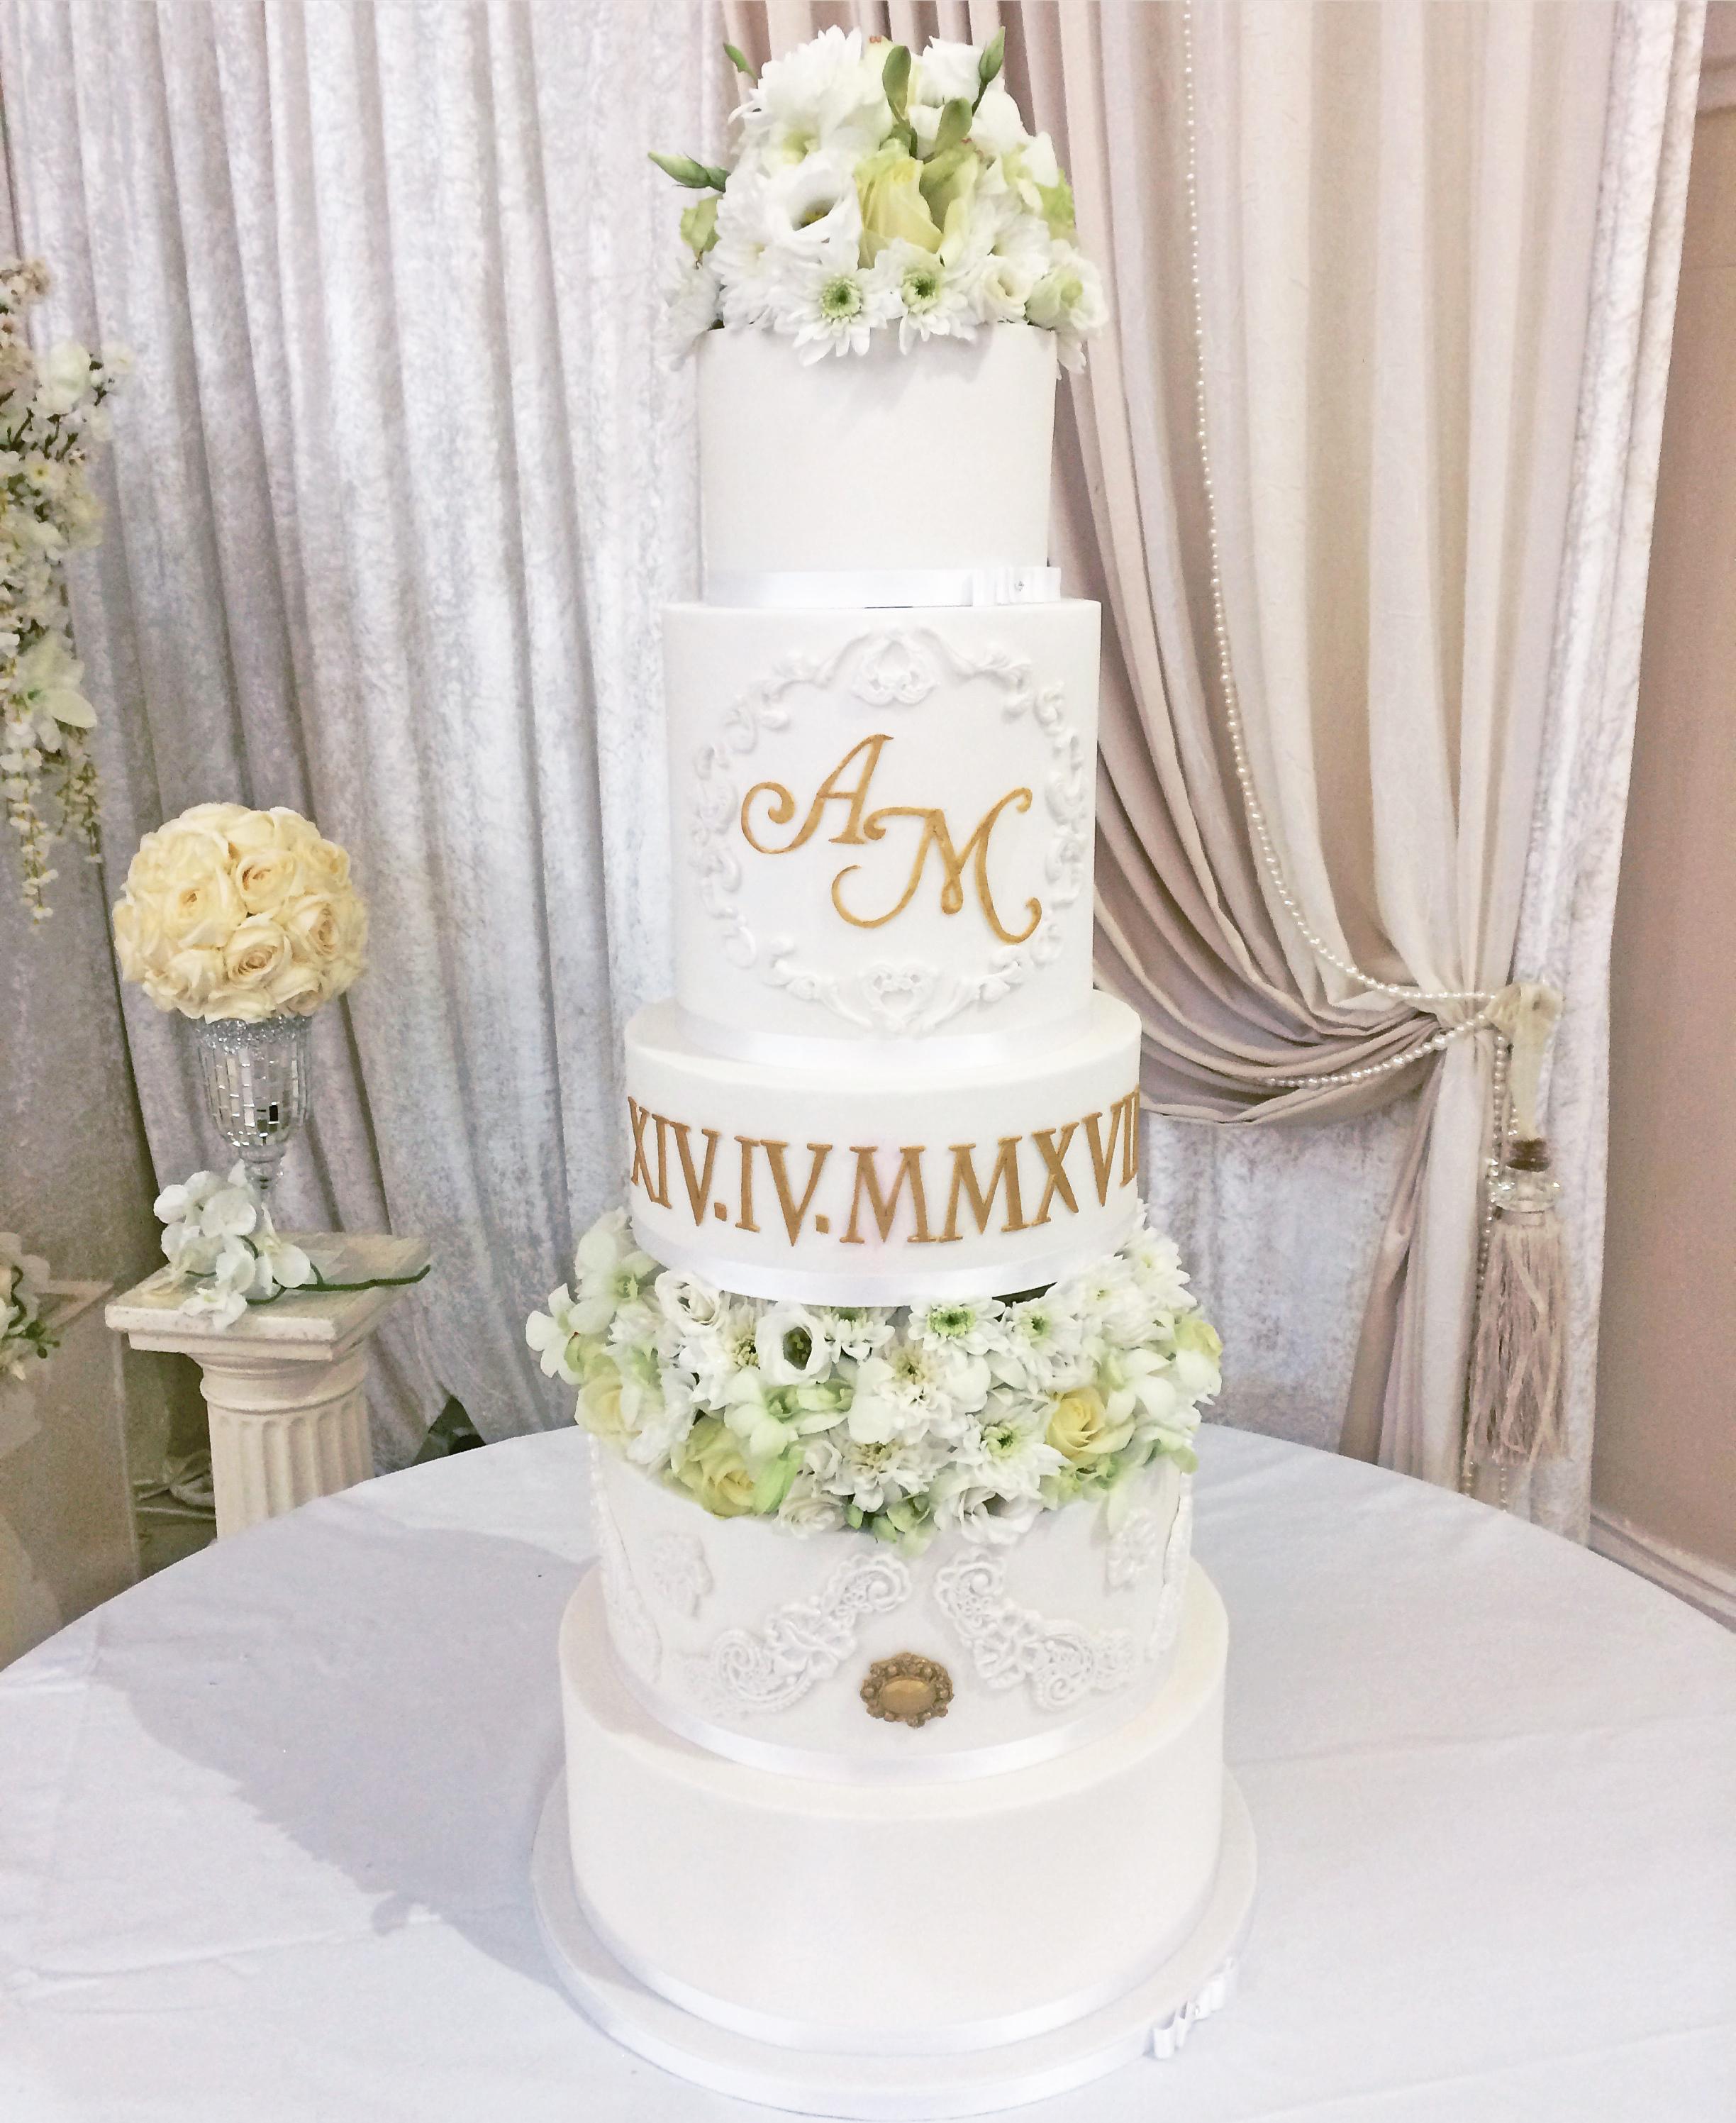 cake gallery of sugarbird cupcakes wedding birthday cake cupcakes. Black Bedroom Furniture Sets. Home Design Ideas